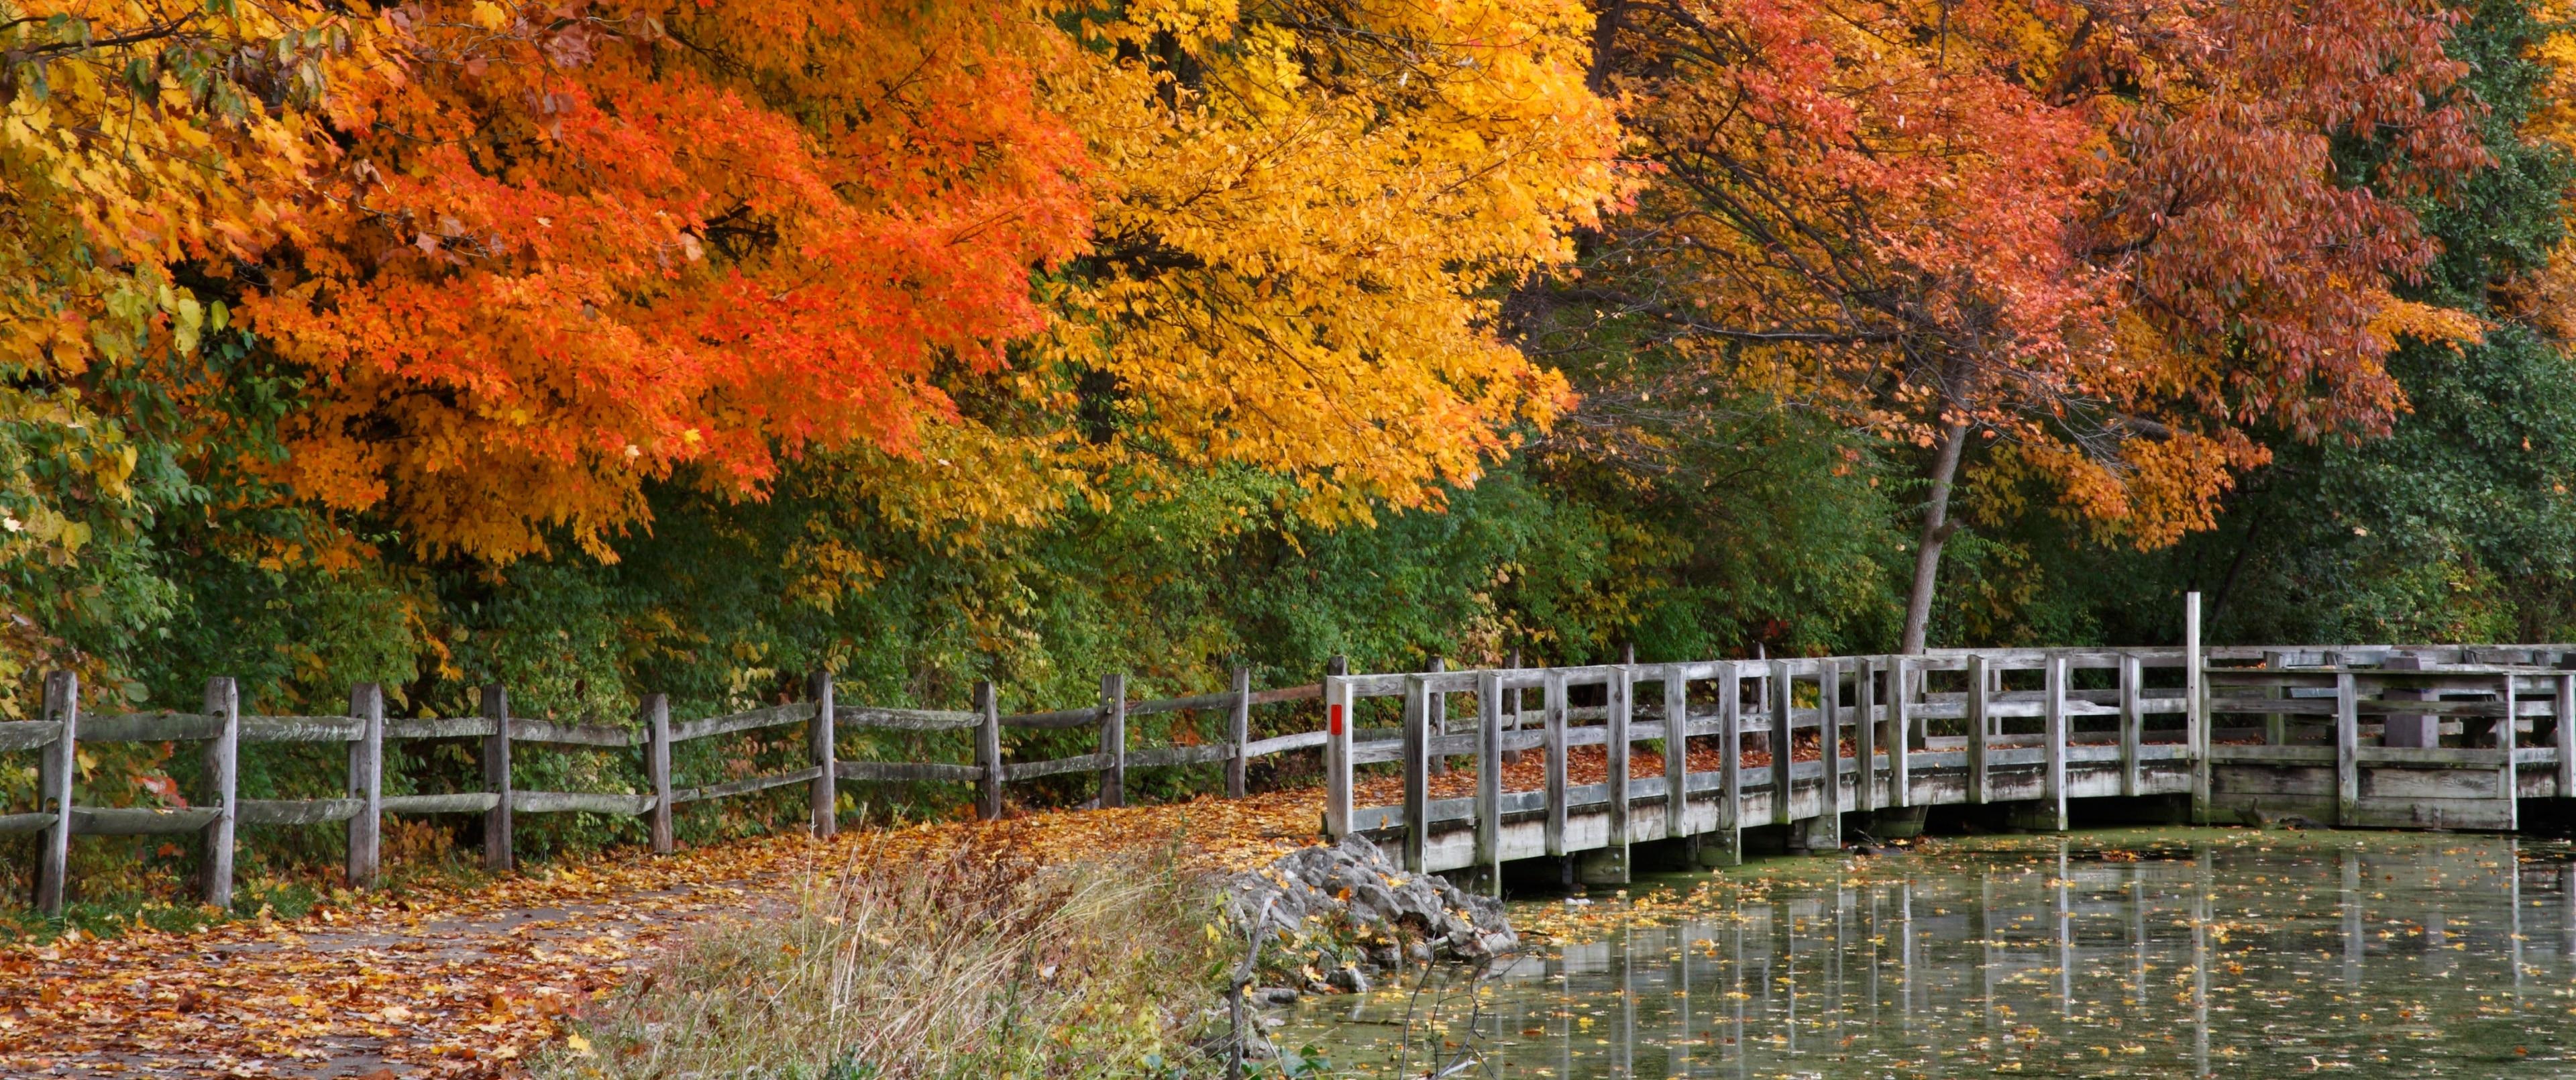 Sharonville, Ohio, United States of America